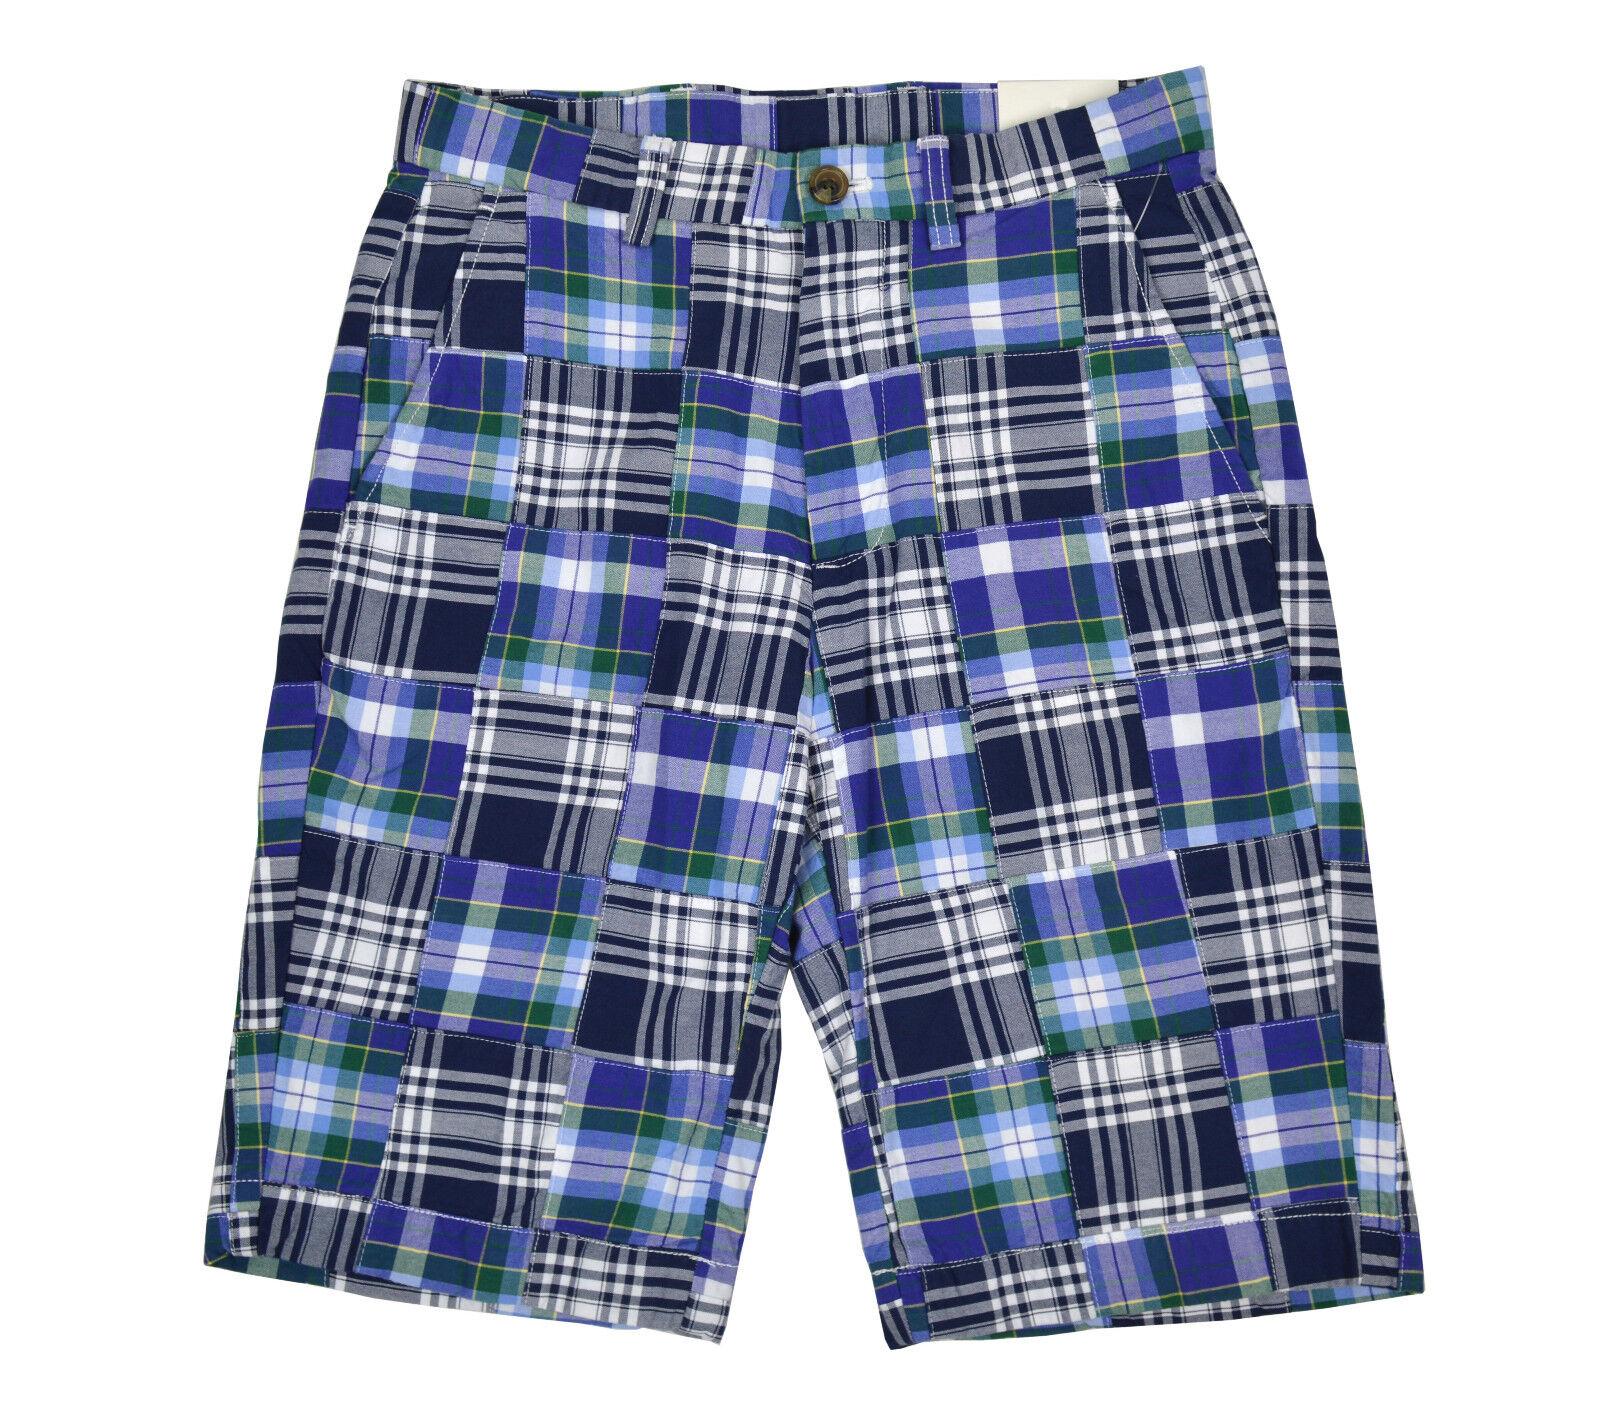 Brooks Brojohers Mens Plaid azul Madras  Pathwork Algodón Pantalones Cortos Talle 5156-4 29 W  forma única